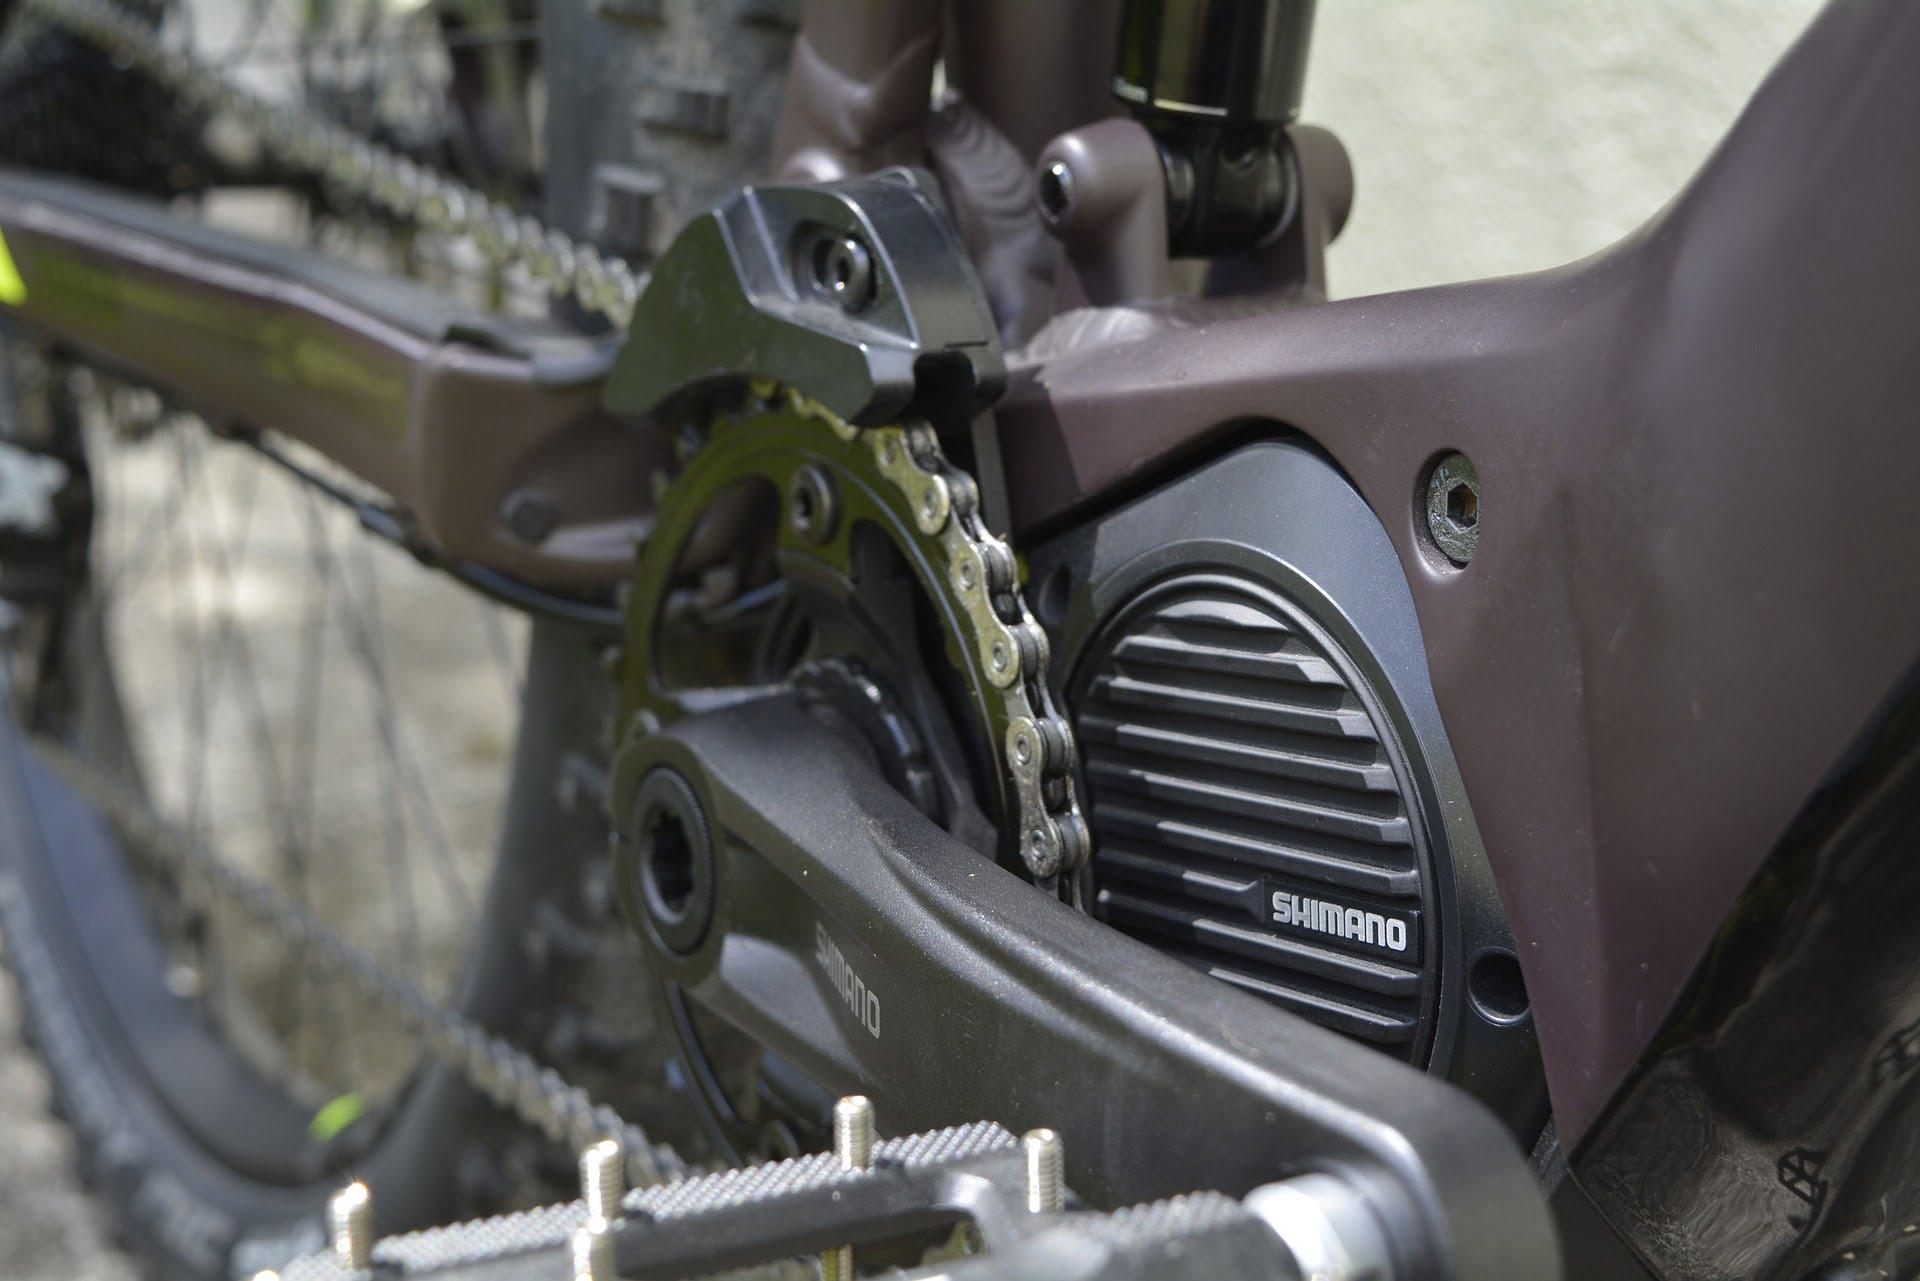 Mountain Bike Manfactures that Still Don't Make E-bikes